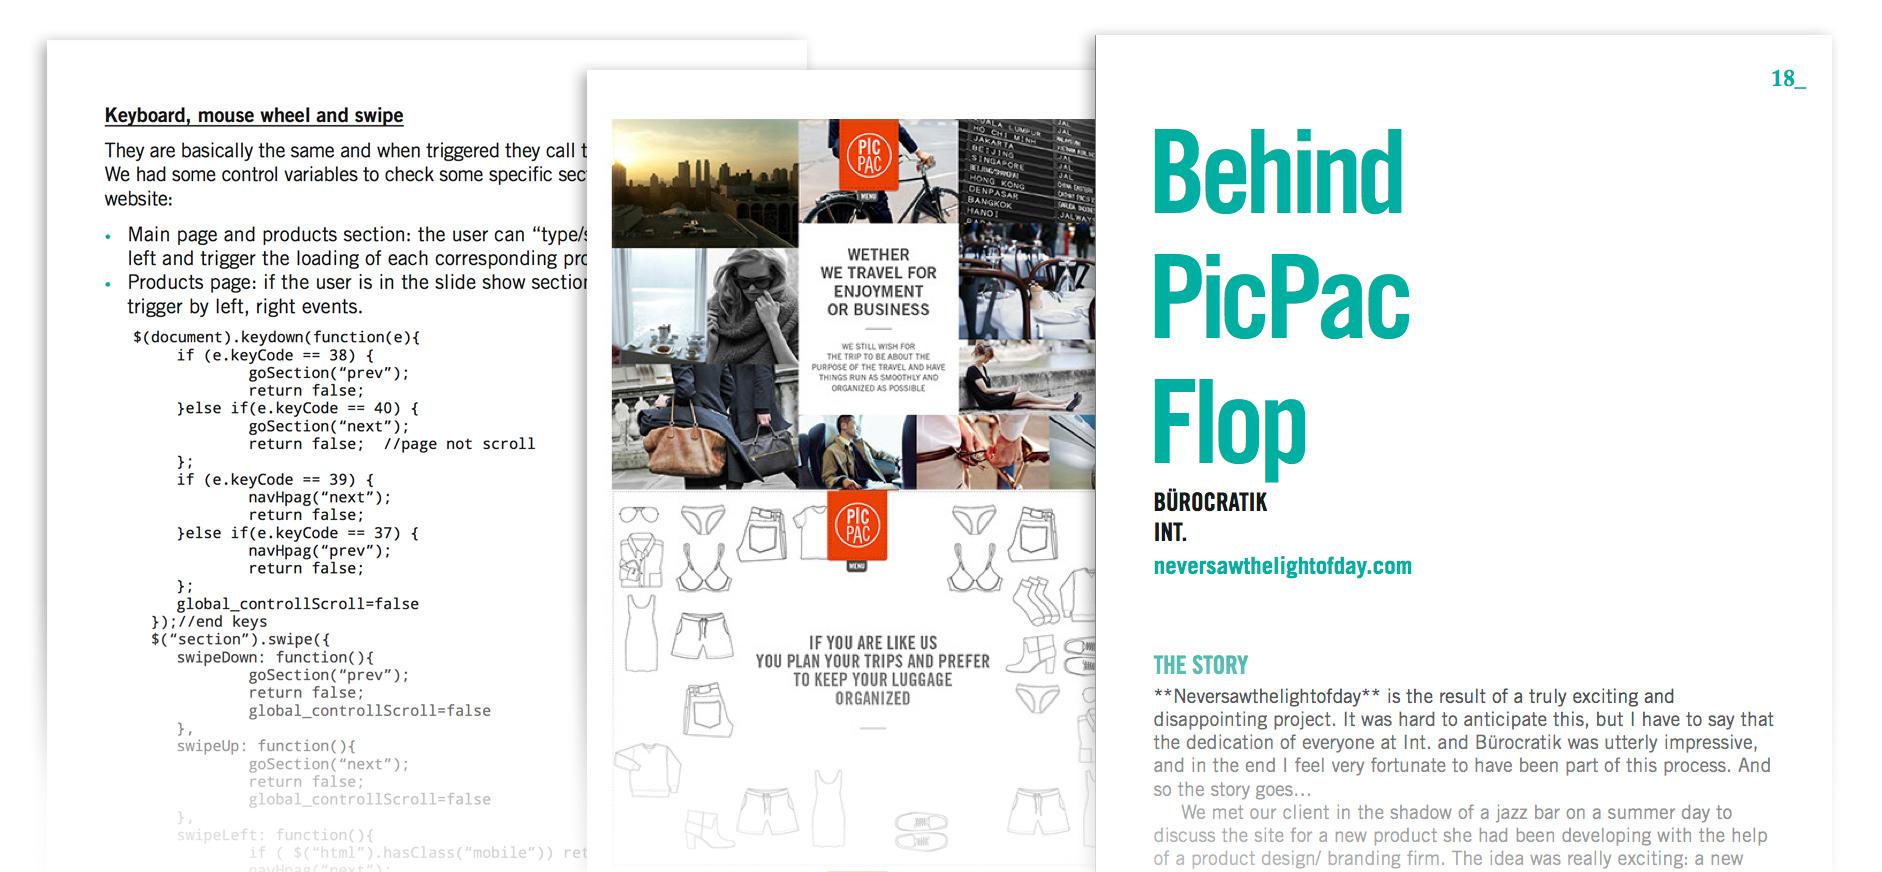 The    Best Websites for Downloading Free eBooks    stWebDesigner SlideShare An Inspiring eBook of   winning case studies